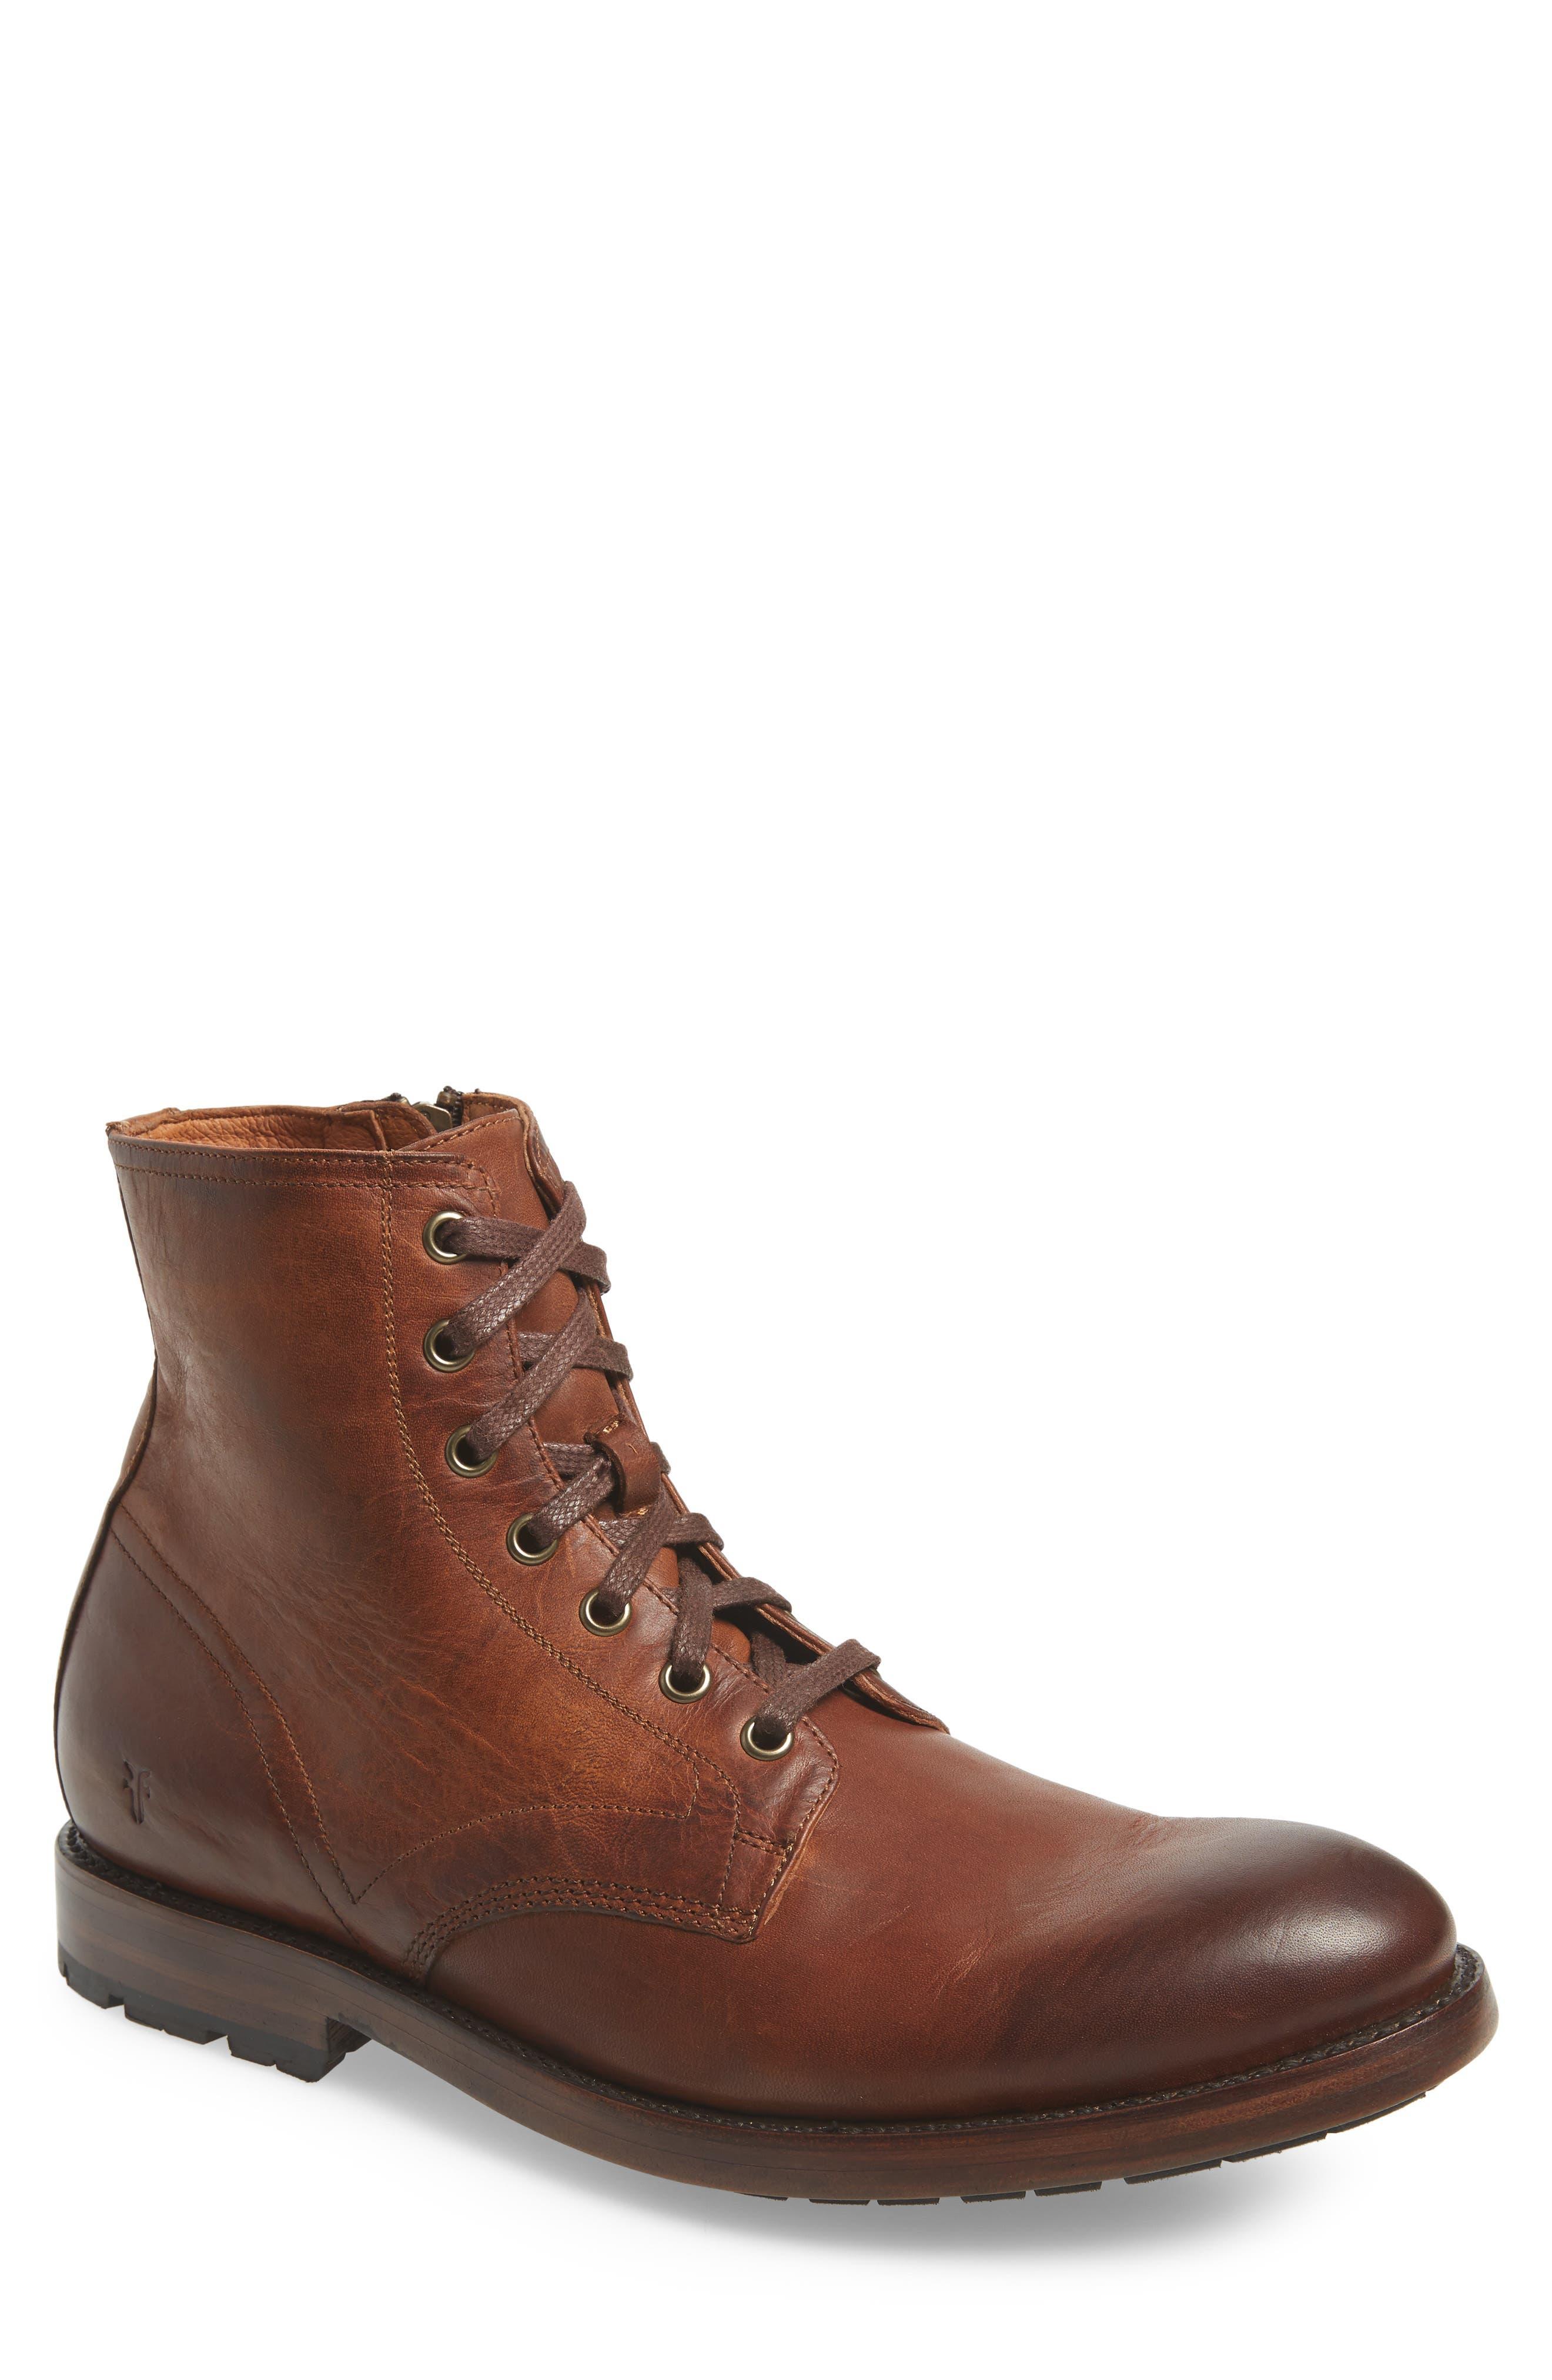 Bowery Plain Toe Boot,                             Main thumbnail 1, color,                             COGNAC